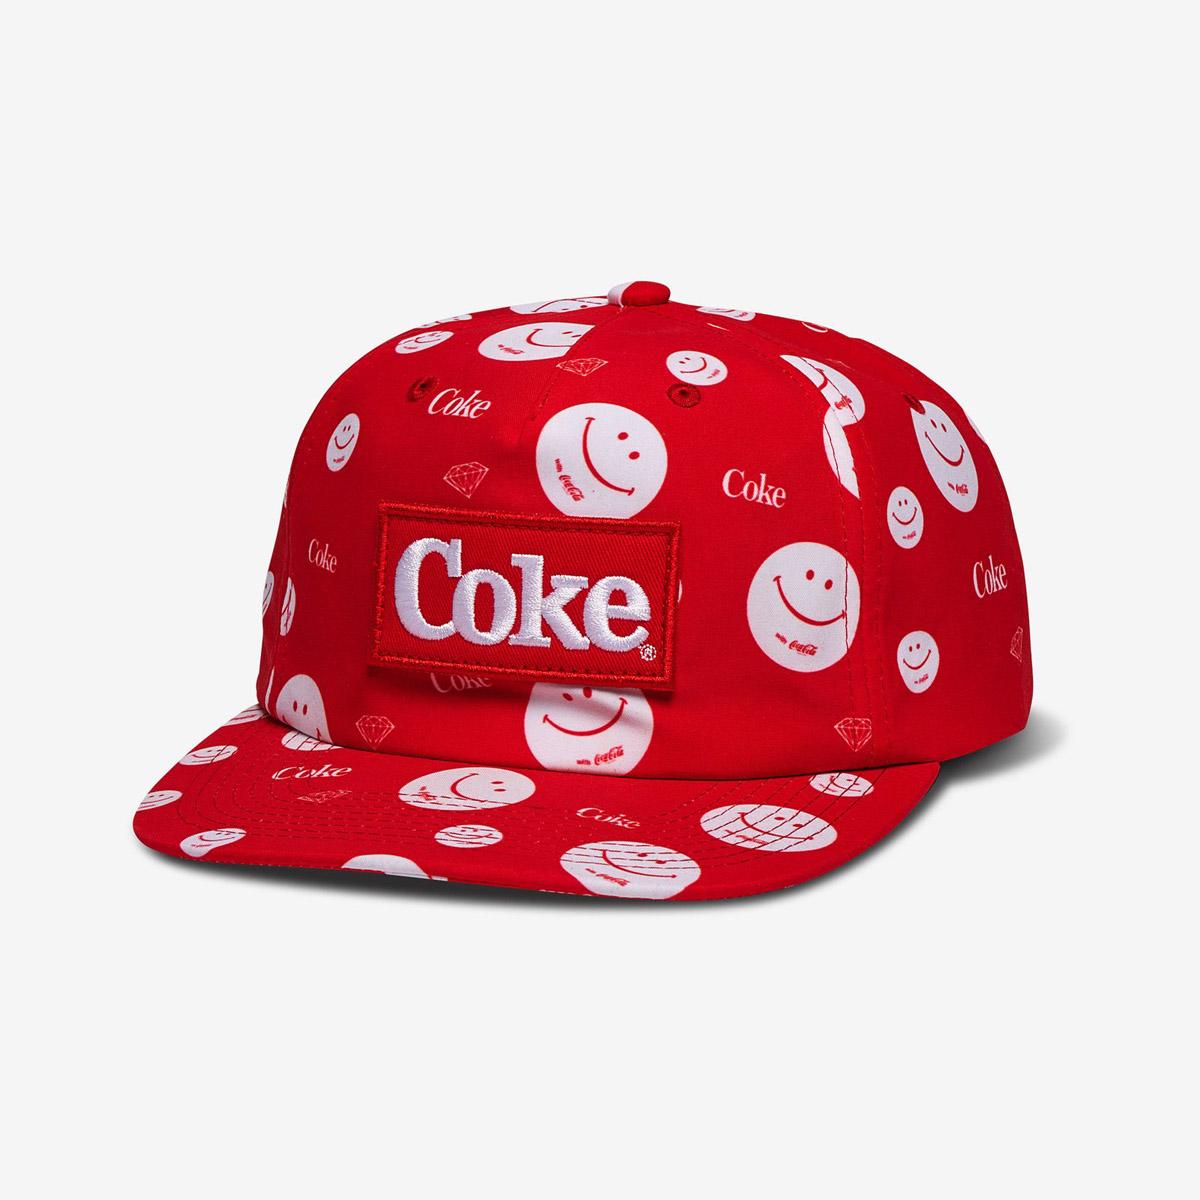 DMD CAP ADJ COKE SMILEY RED - Click to enlarge